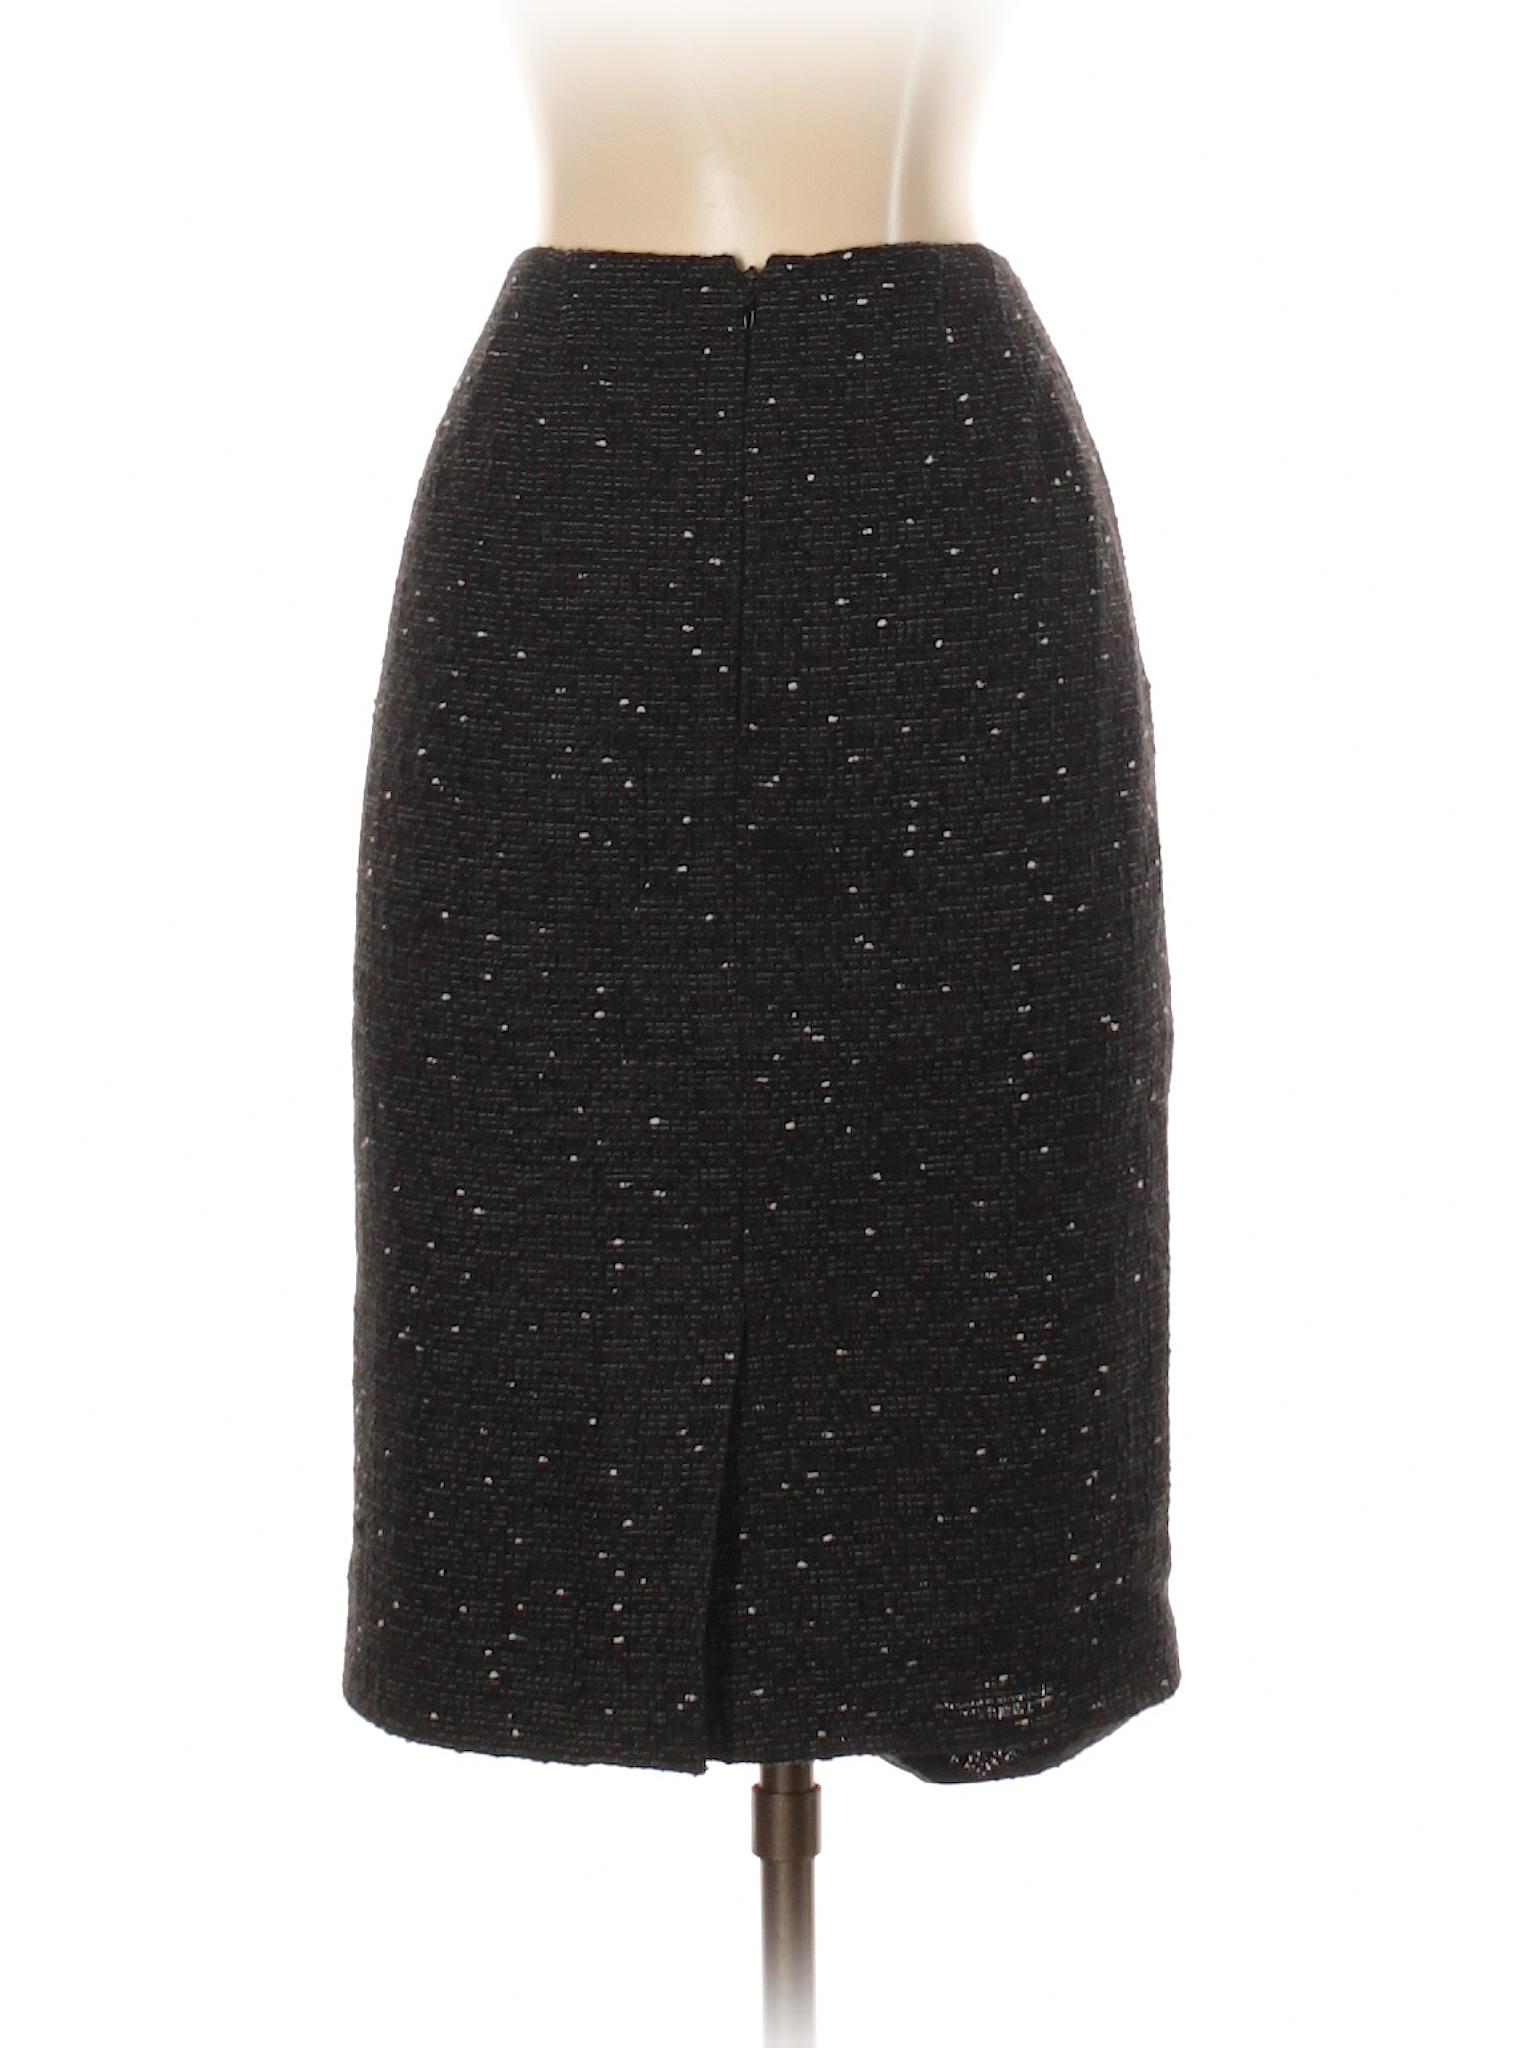 Skirt Skirt Skirt Boutique Boutique Casual Casual Boutique Boutique Casual 5qwf18